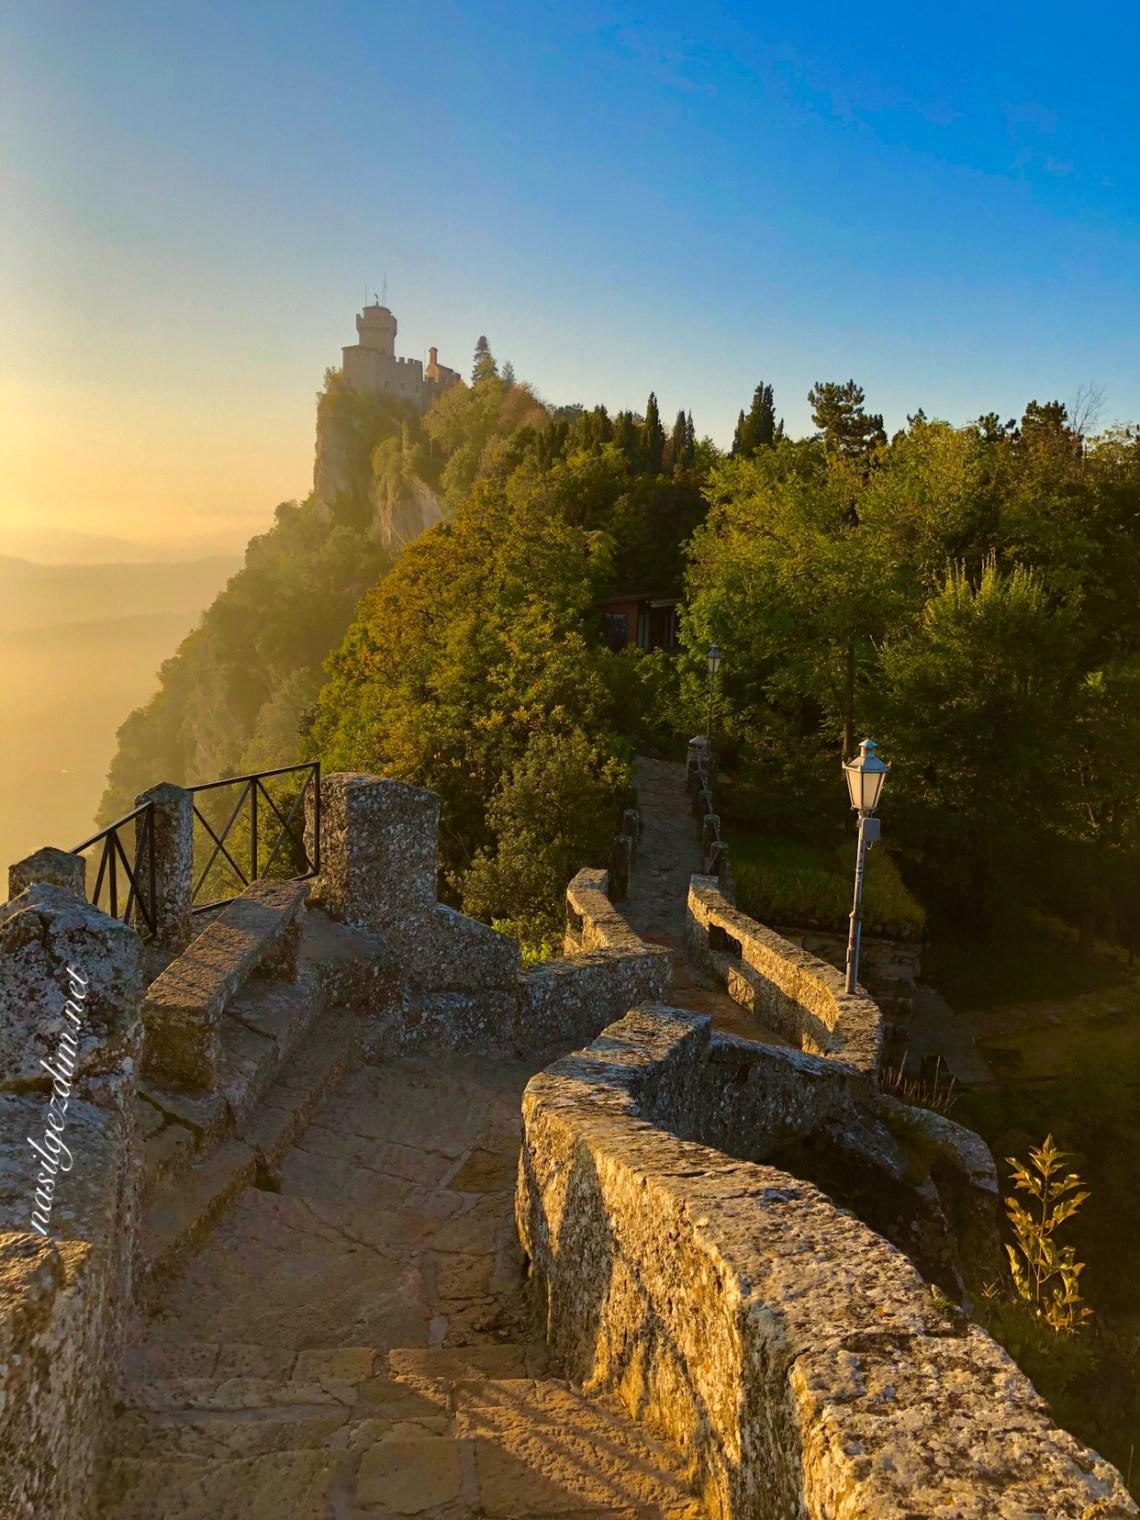 san marino gezilecek yerler, san marino gezi rehberi, san marino nerede, san marino gez notları, San Marino Passo Delle Streghe